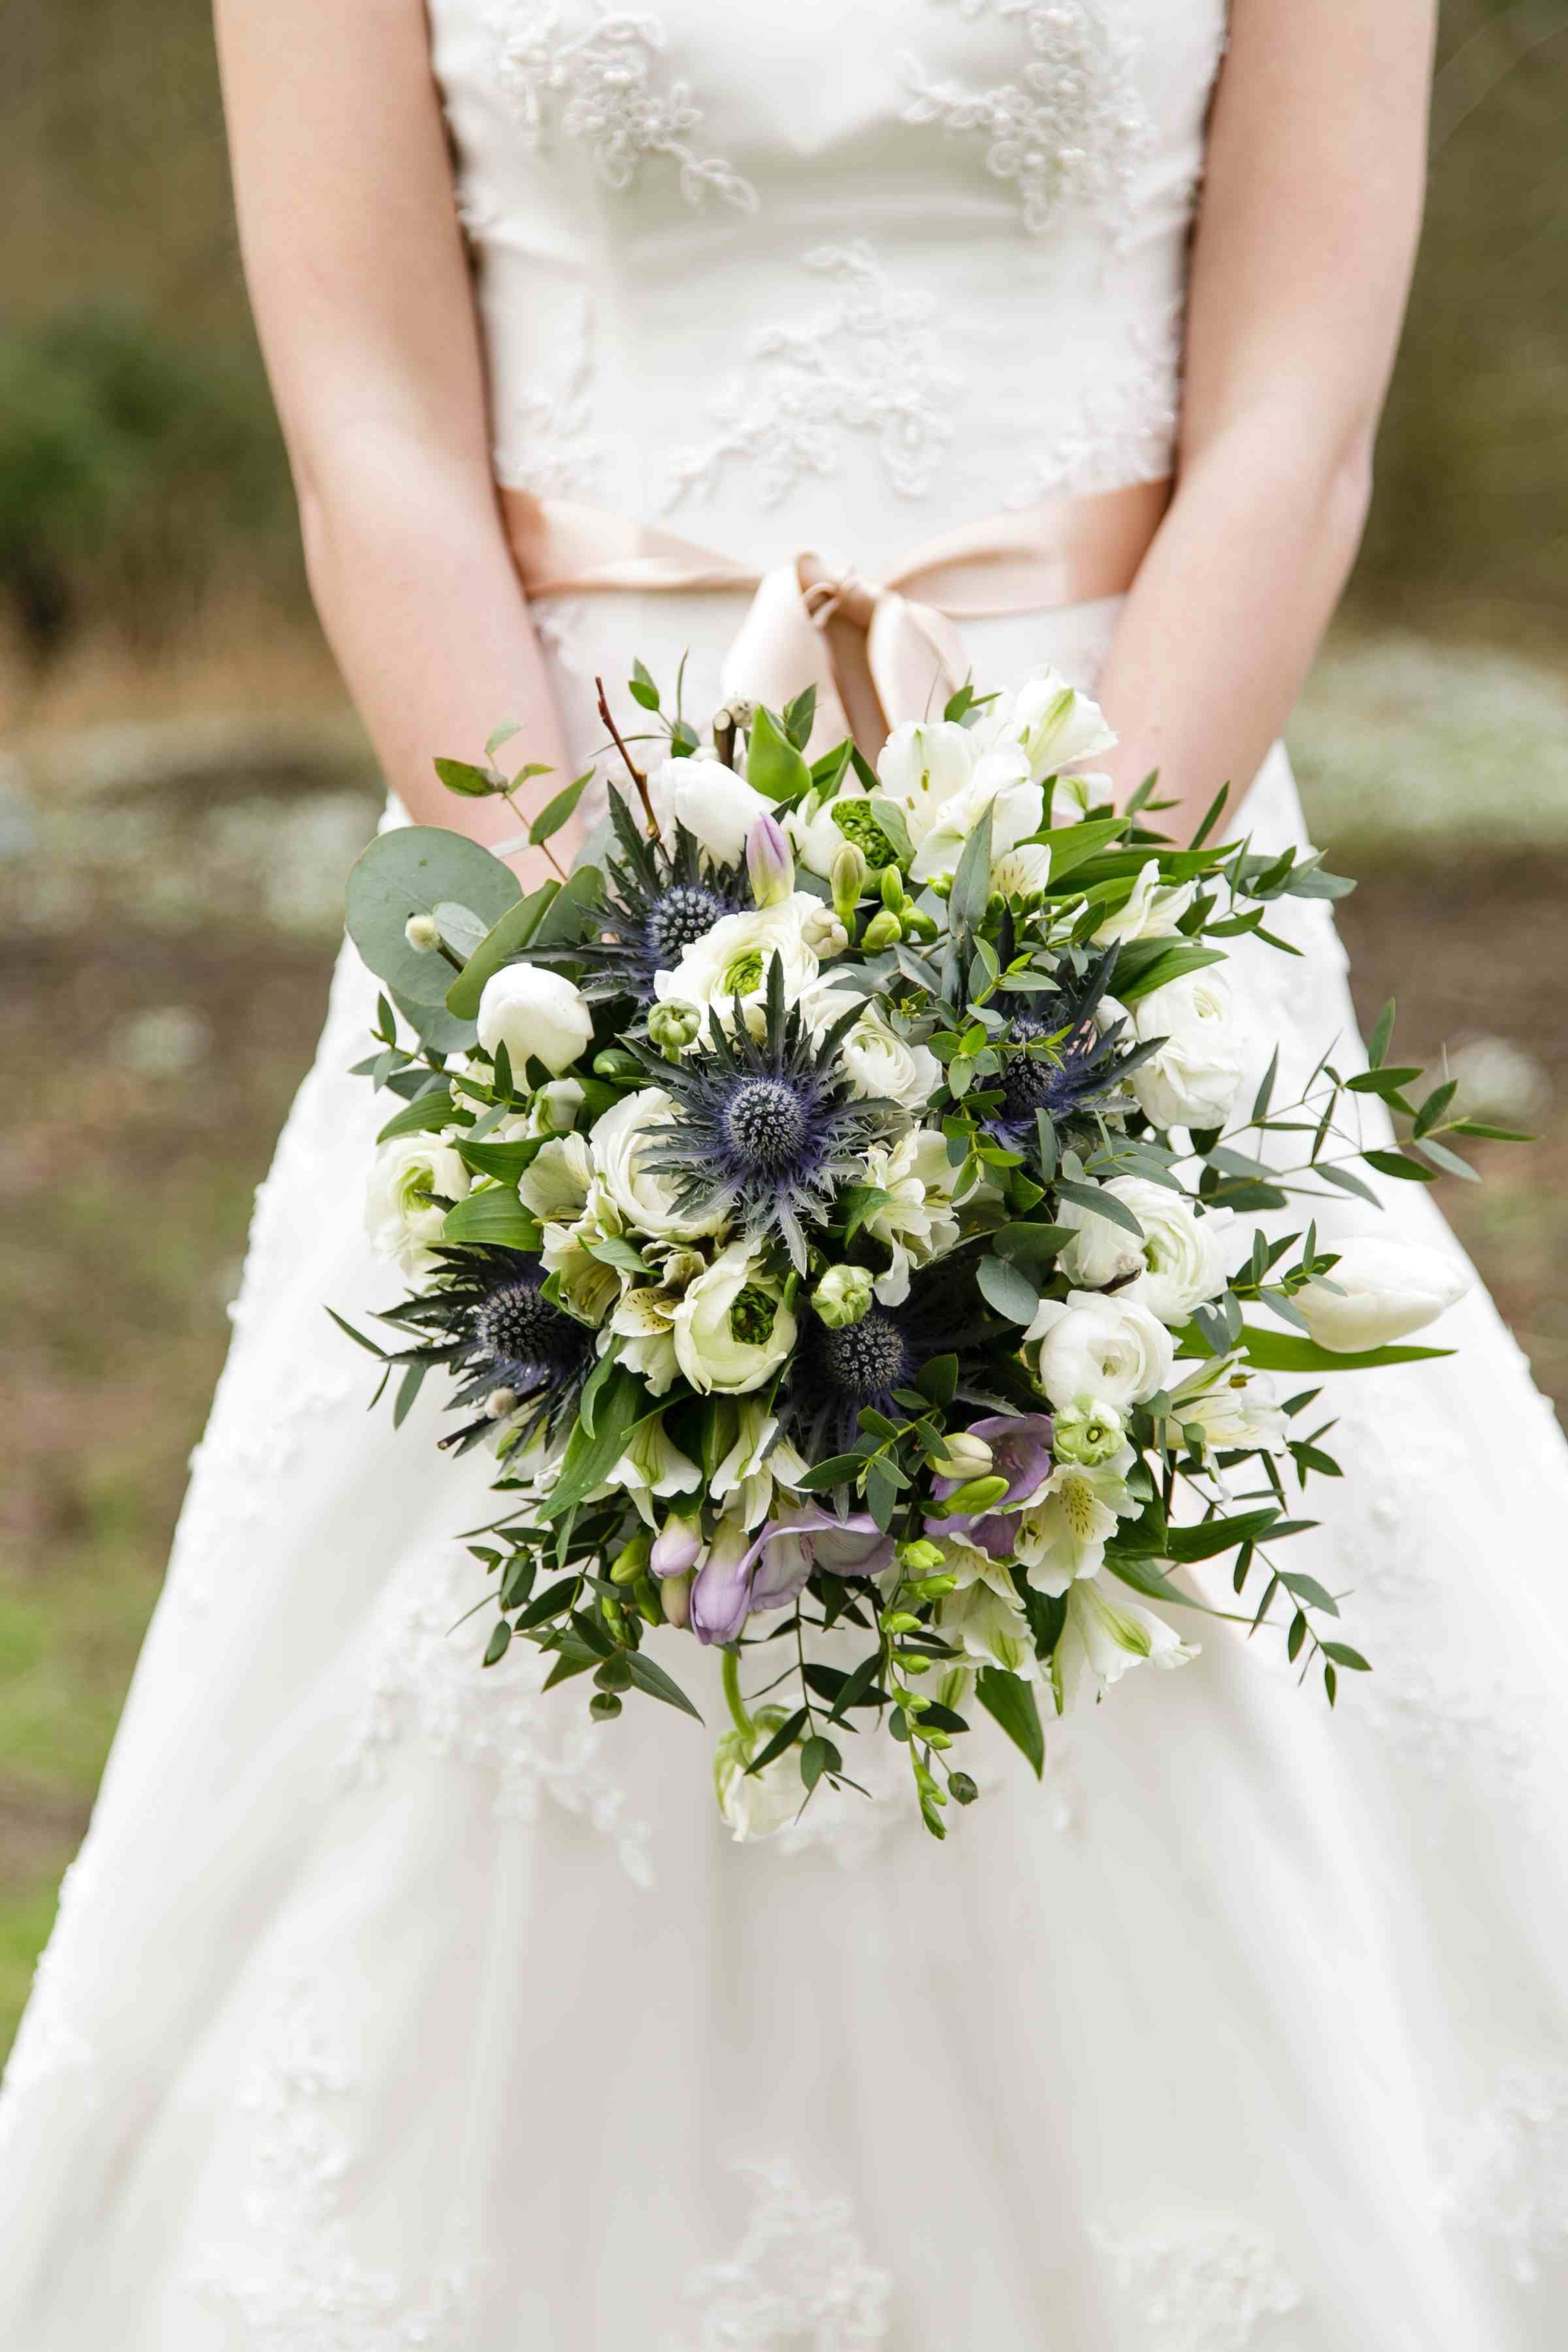 February Wedding Flowers February wedding flowers